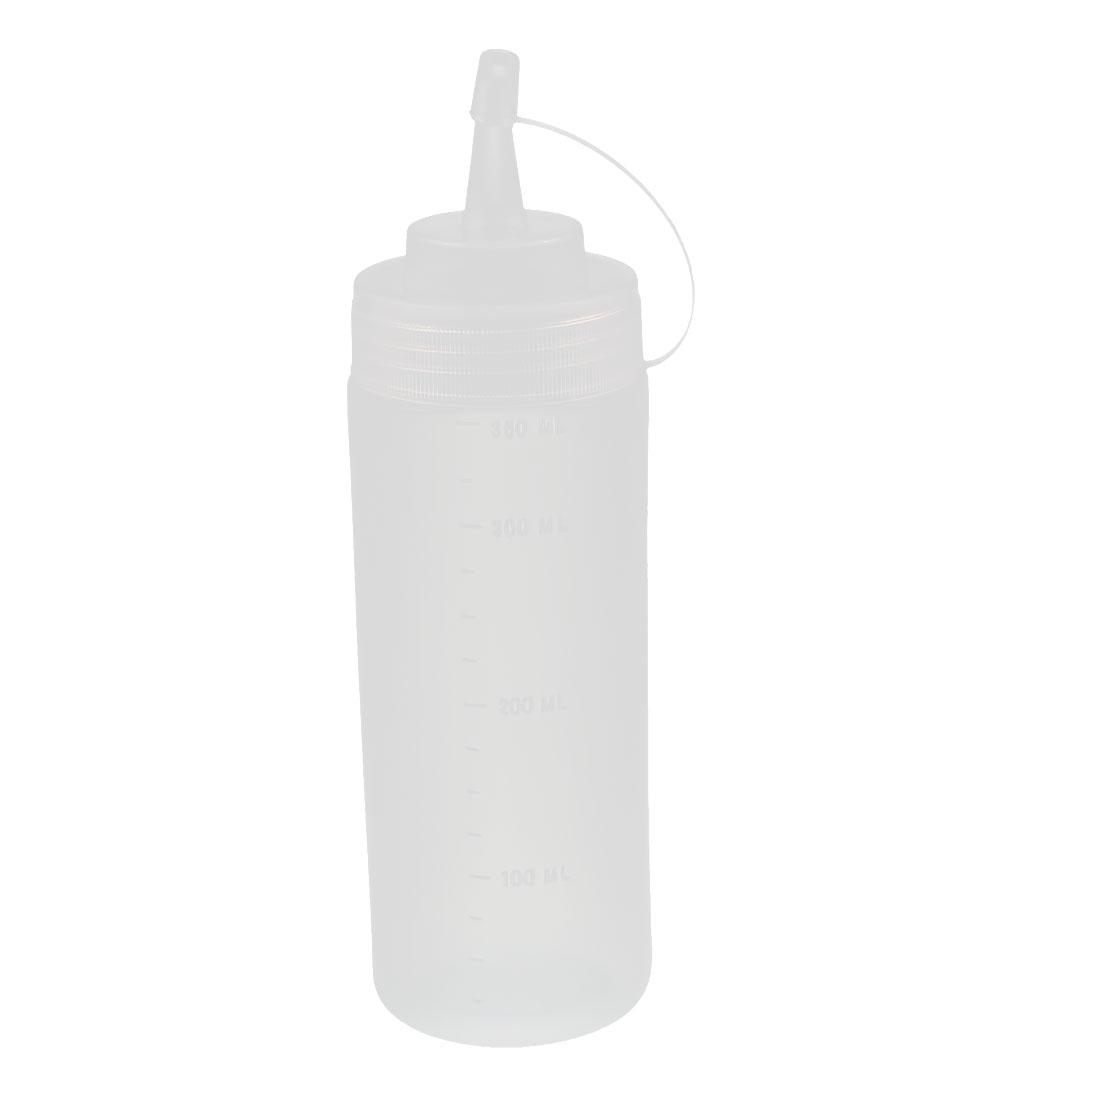 360ml 12oz Clear Plastic Food Squeeze Bottles Condiment Ketchup Mustard Oil Salt